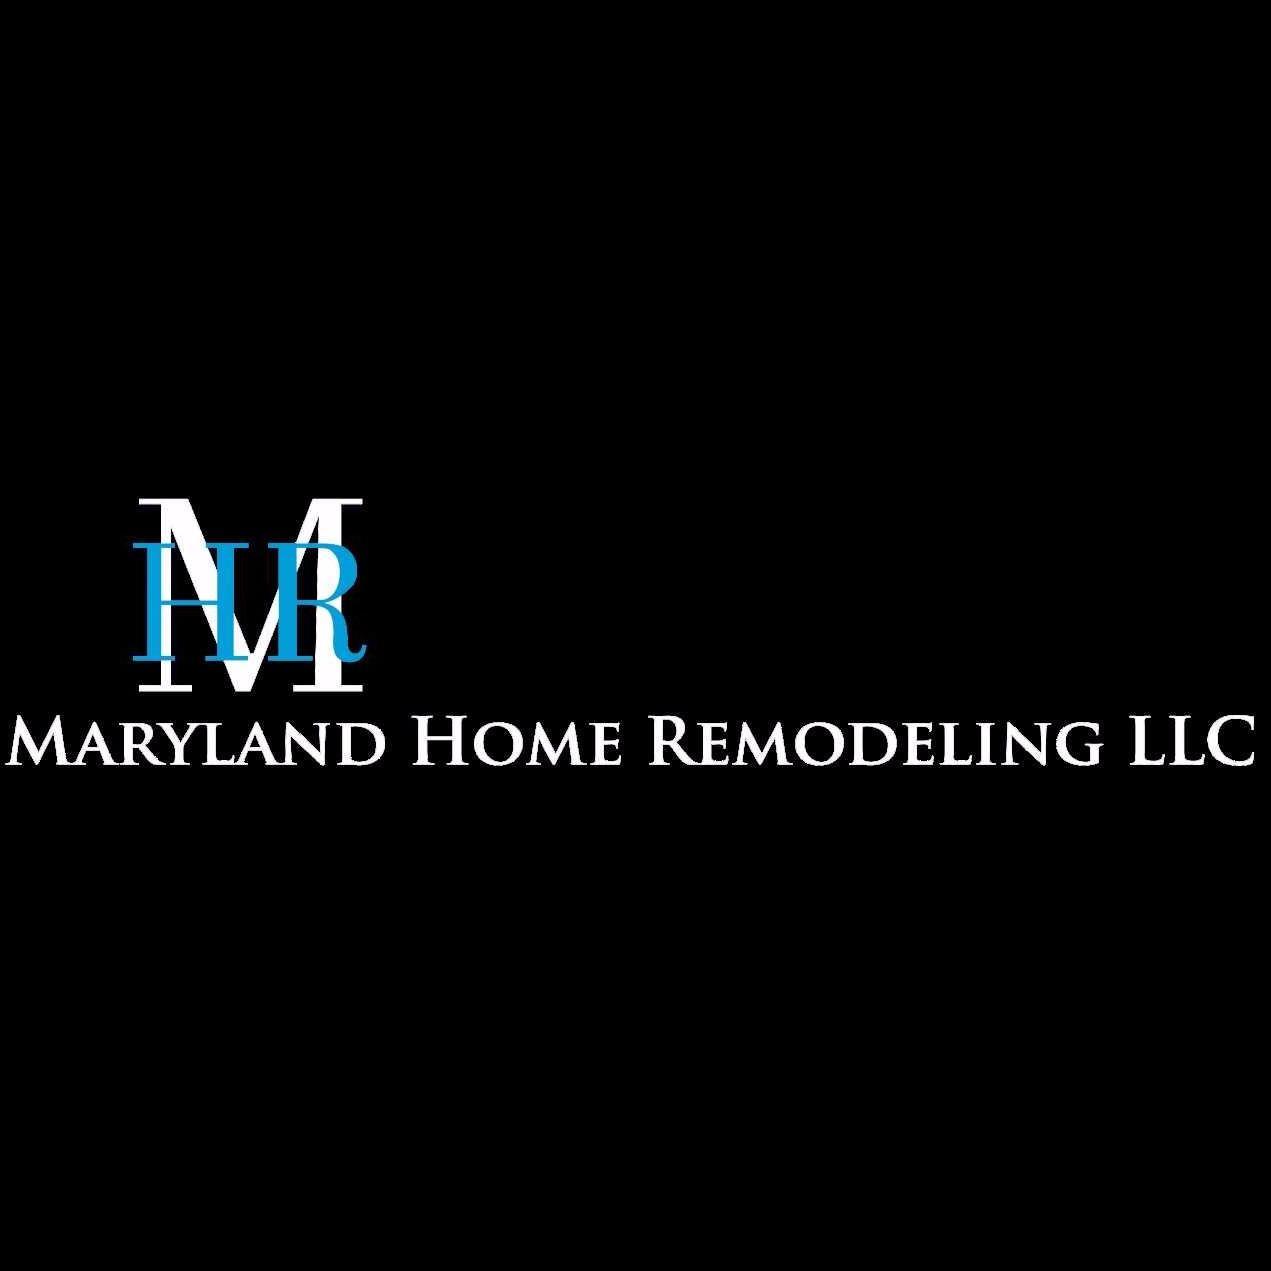 Maryland Home Remodeling LLC